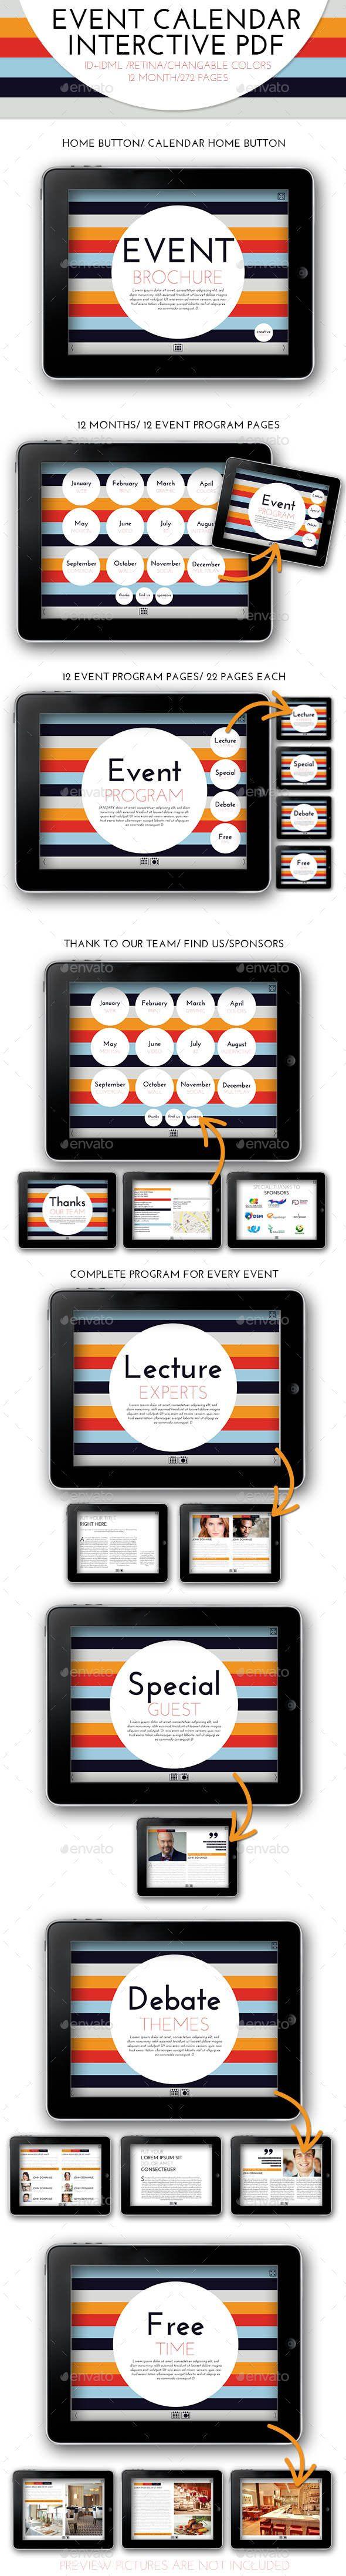 Interctive PDF Event Calendar Template #design Download: http://graphicriver.net/item/interctive-pdf-event-calendar/10336221?ref=ksioks